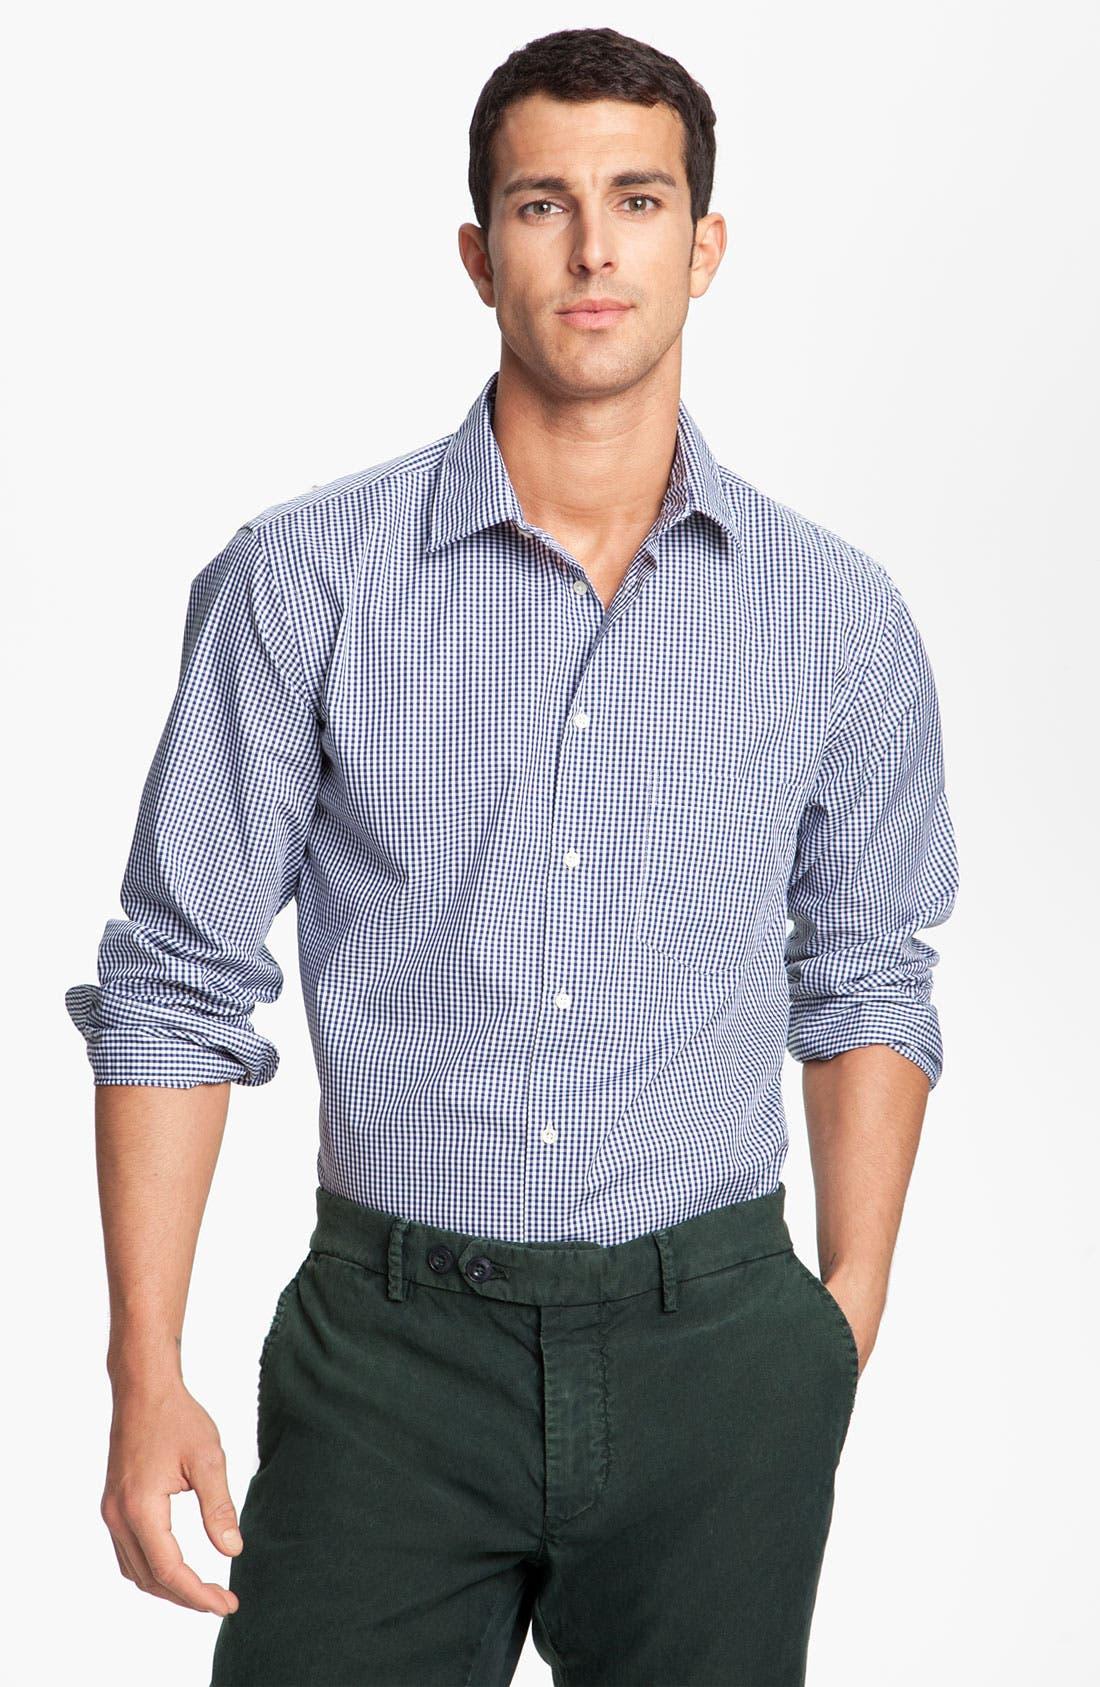 Main Image - Mason's Micro Gingham Cotton Shirt